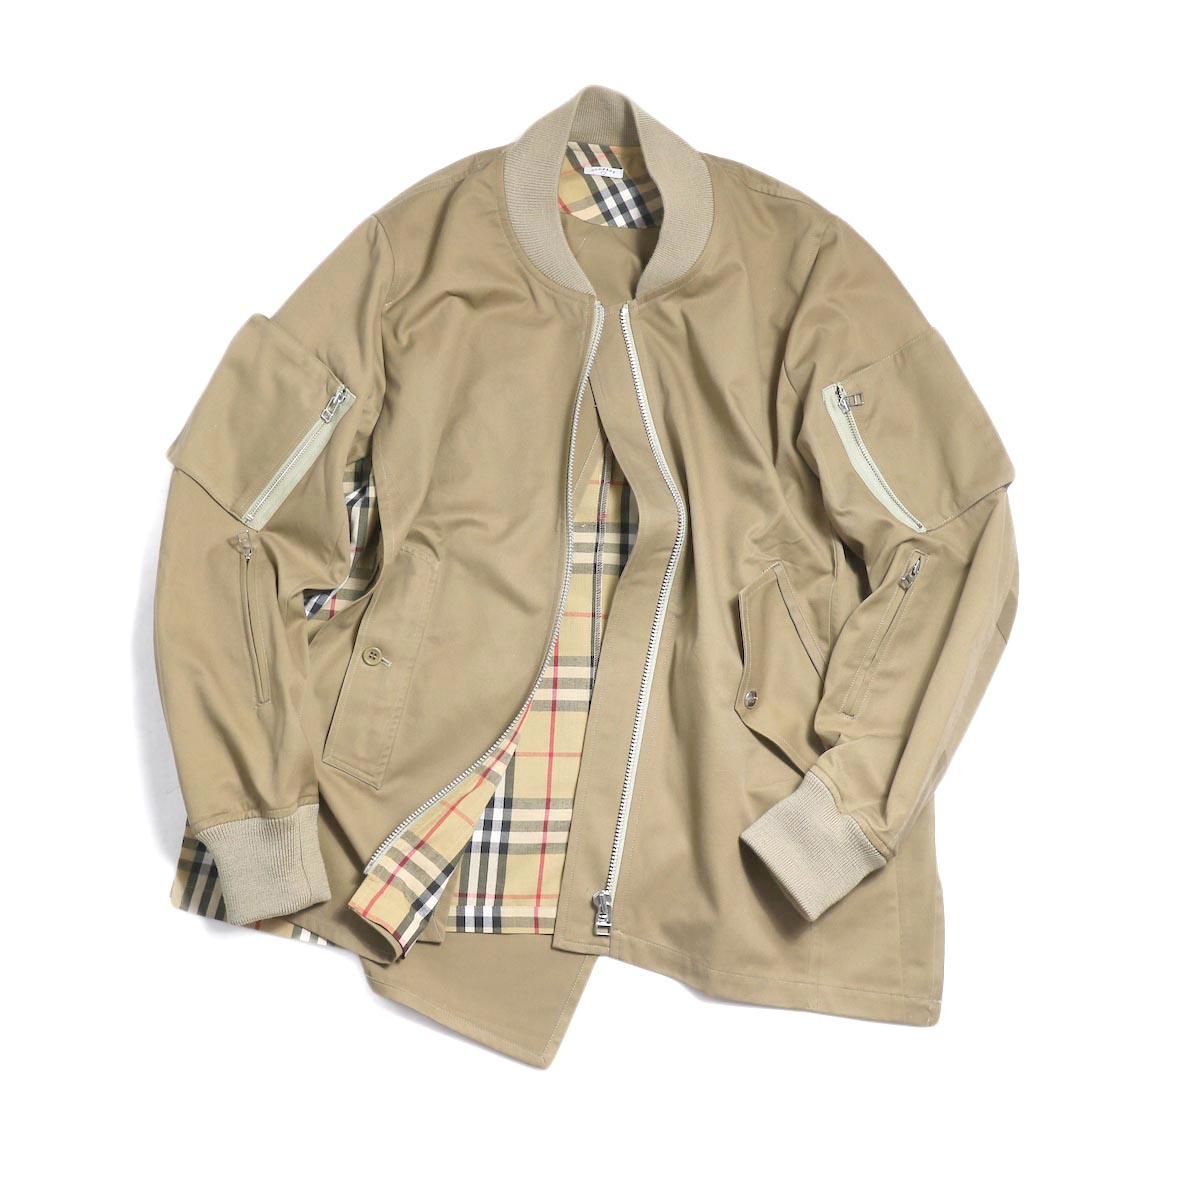 OLD PARK / F.L Flight Jacket (Burberry)